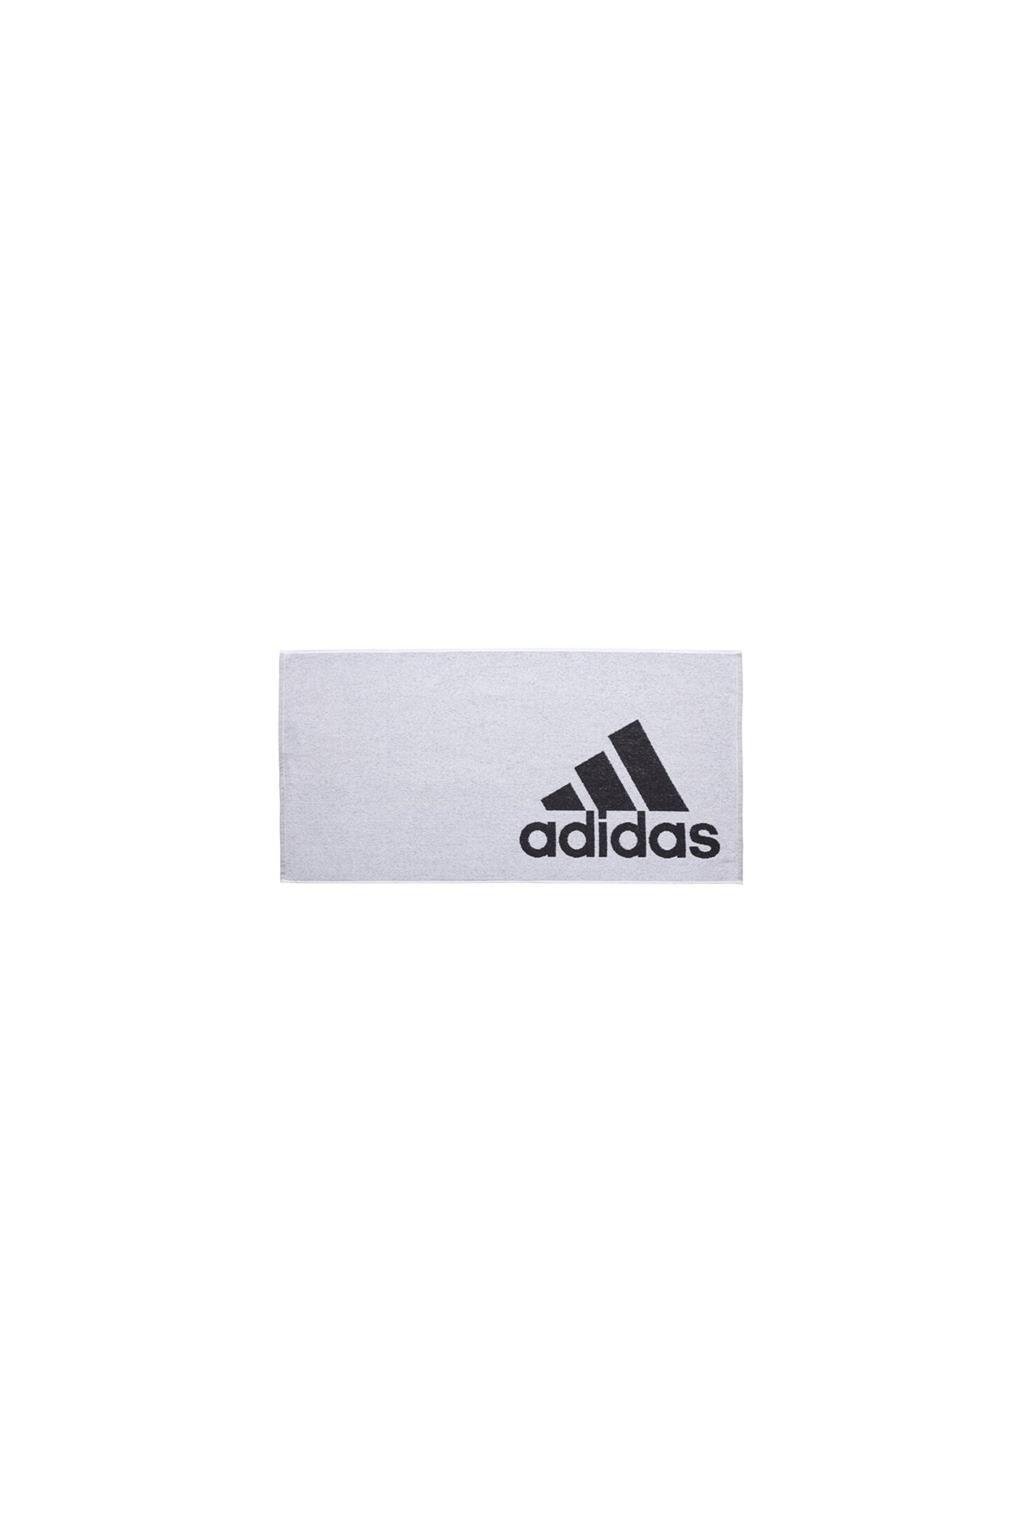 recznik adidas towel s dh2862 przo